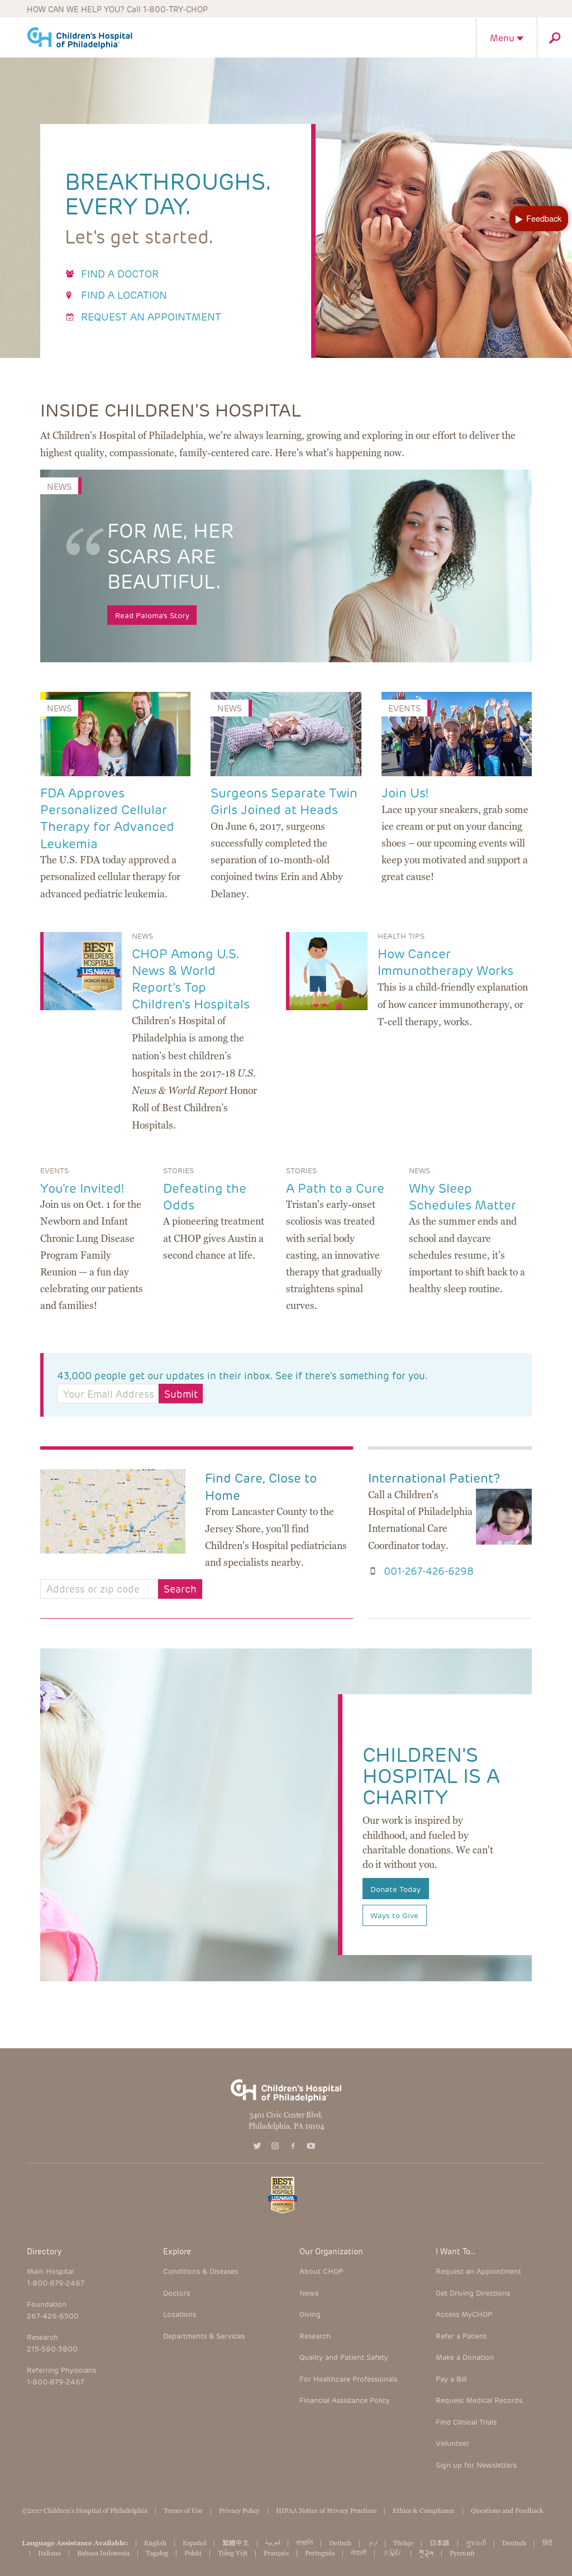 Children's Hospital of Philadelphia Competitors, Revenue and